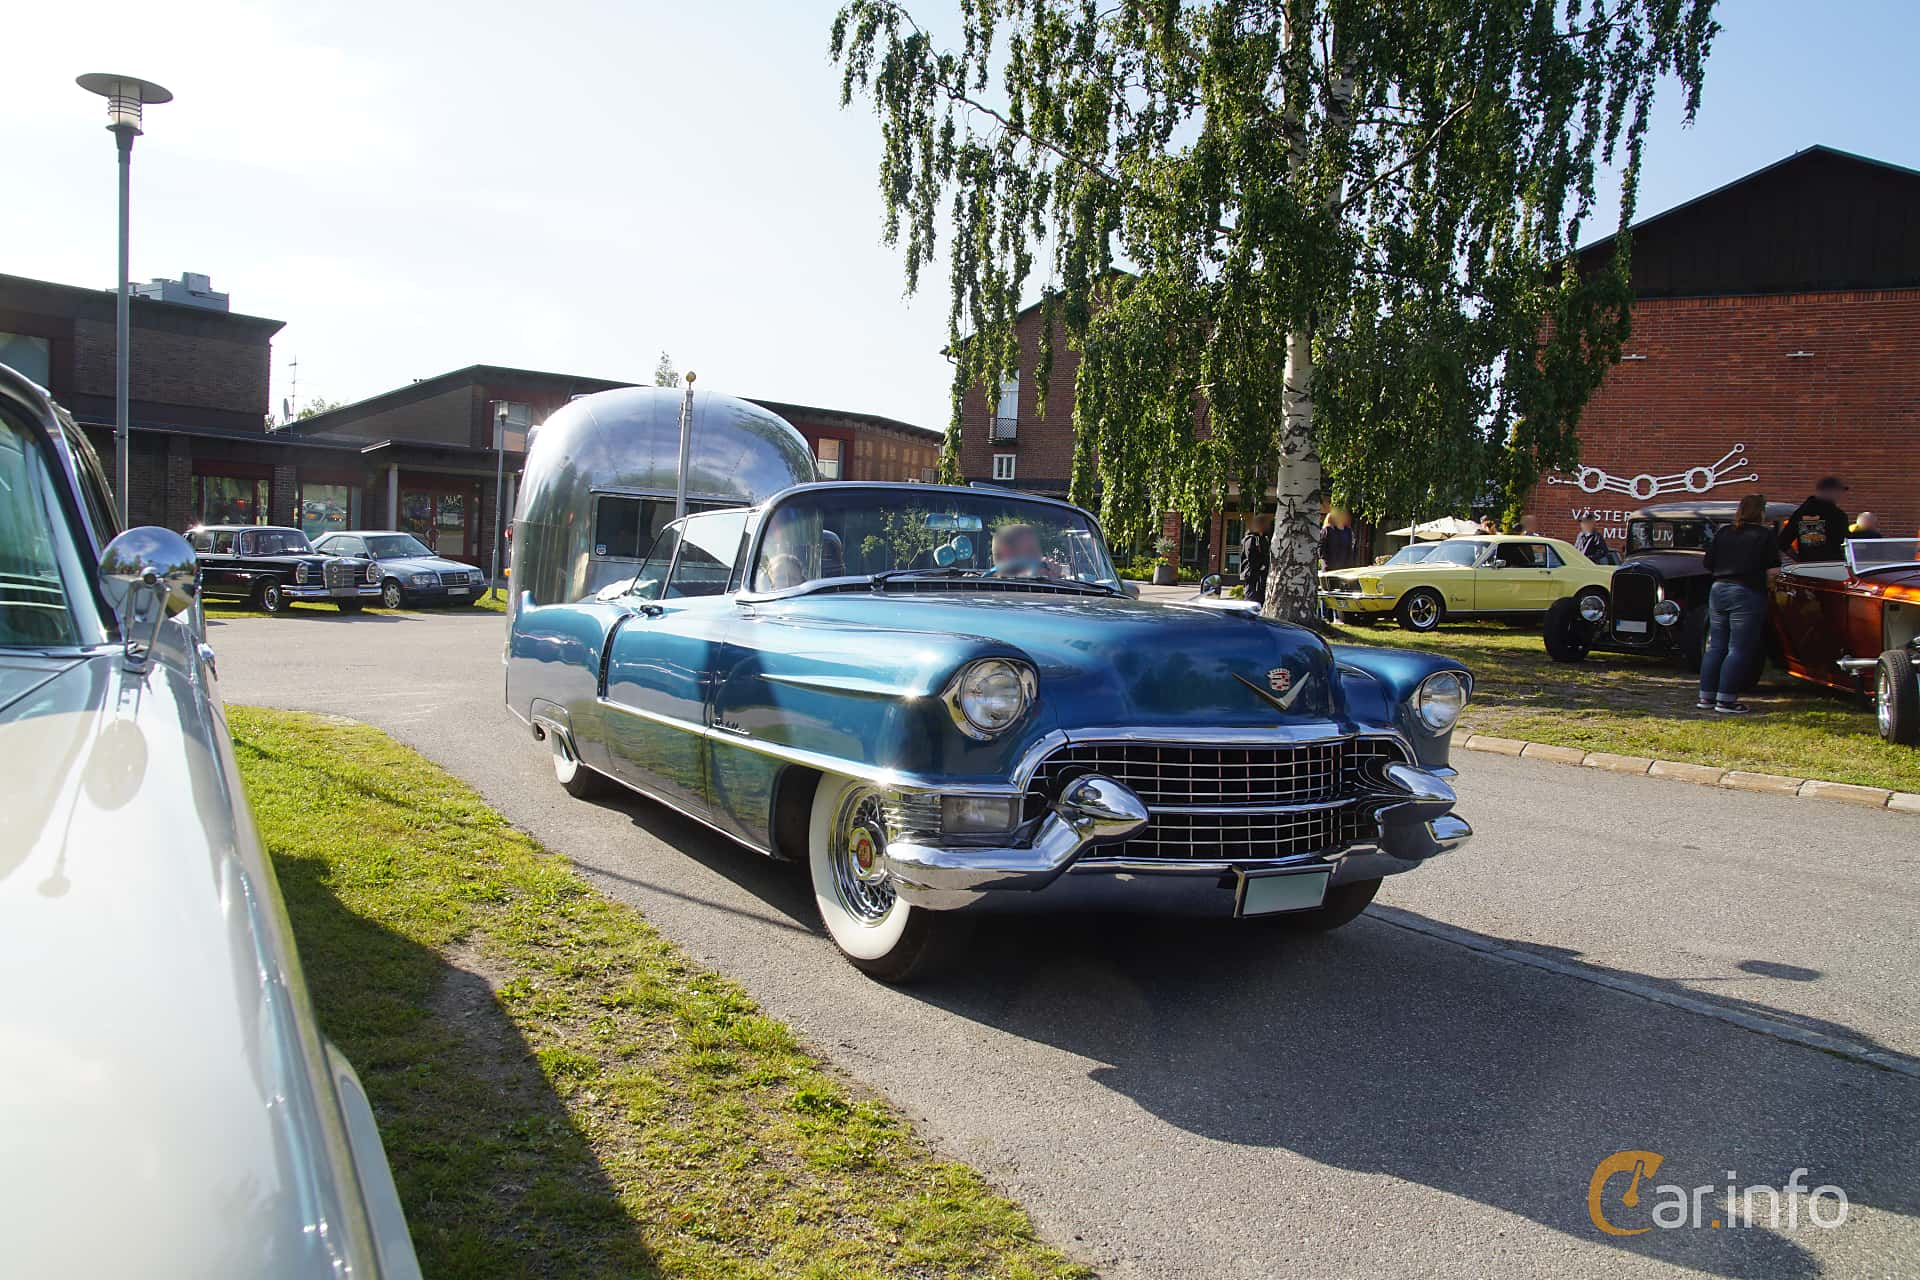 Cadillac Sixty-Two Convertible Coupé 5.4 V8 Automatic, 254hp, 1955 at Onsdagsträffar på Gammlia Umeå 2019 vecka 28